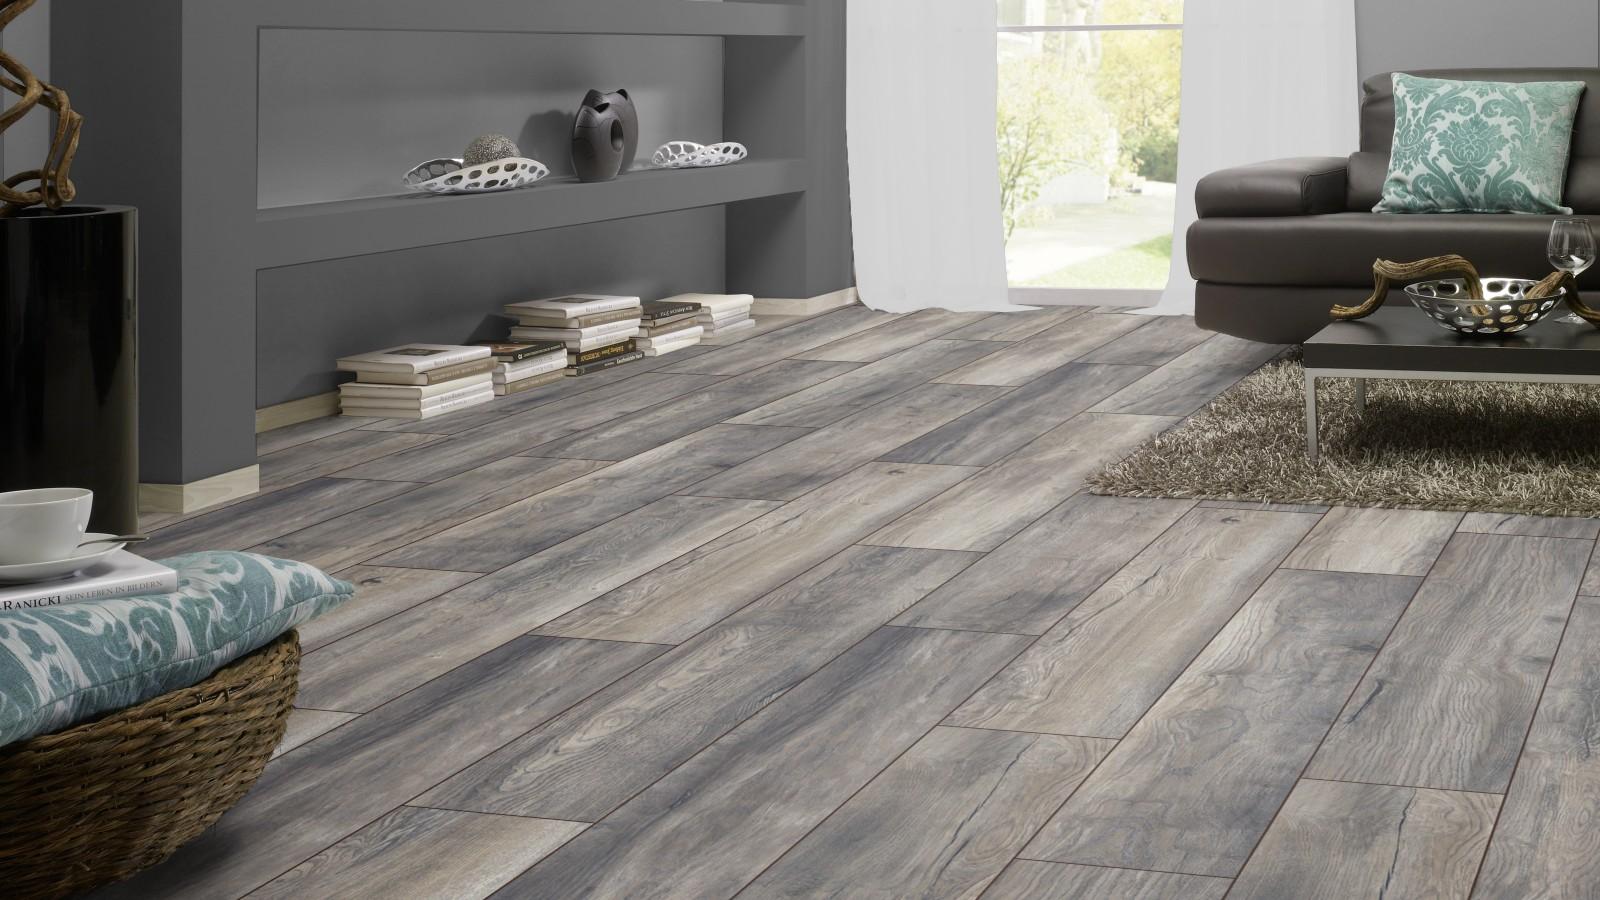 Ac4 8mm Harbour Oak Grey Wide Board Laminate Flooring